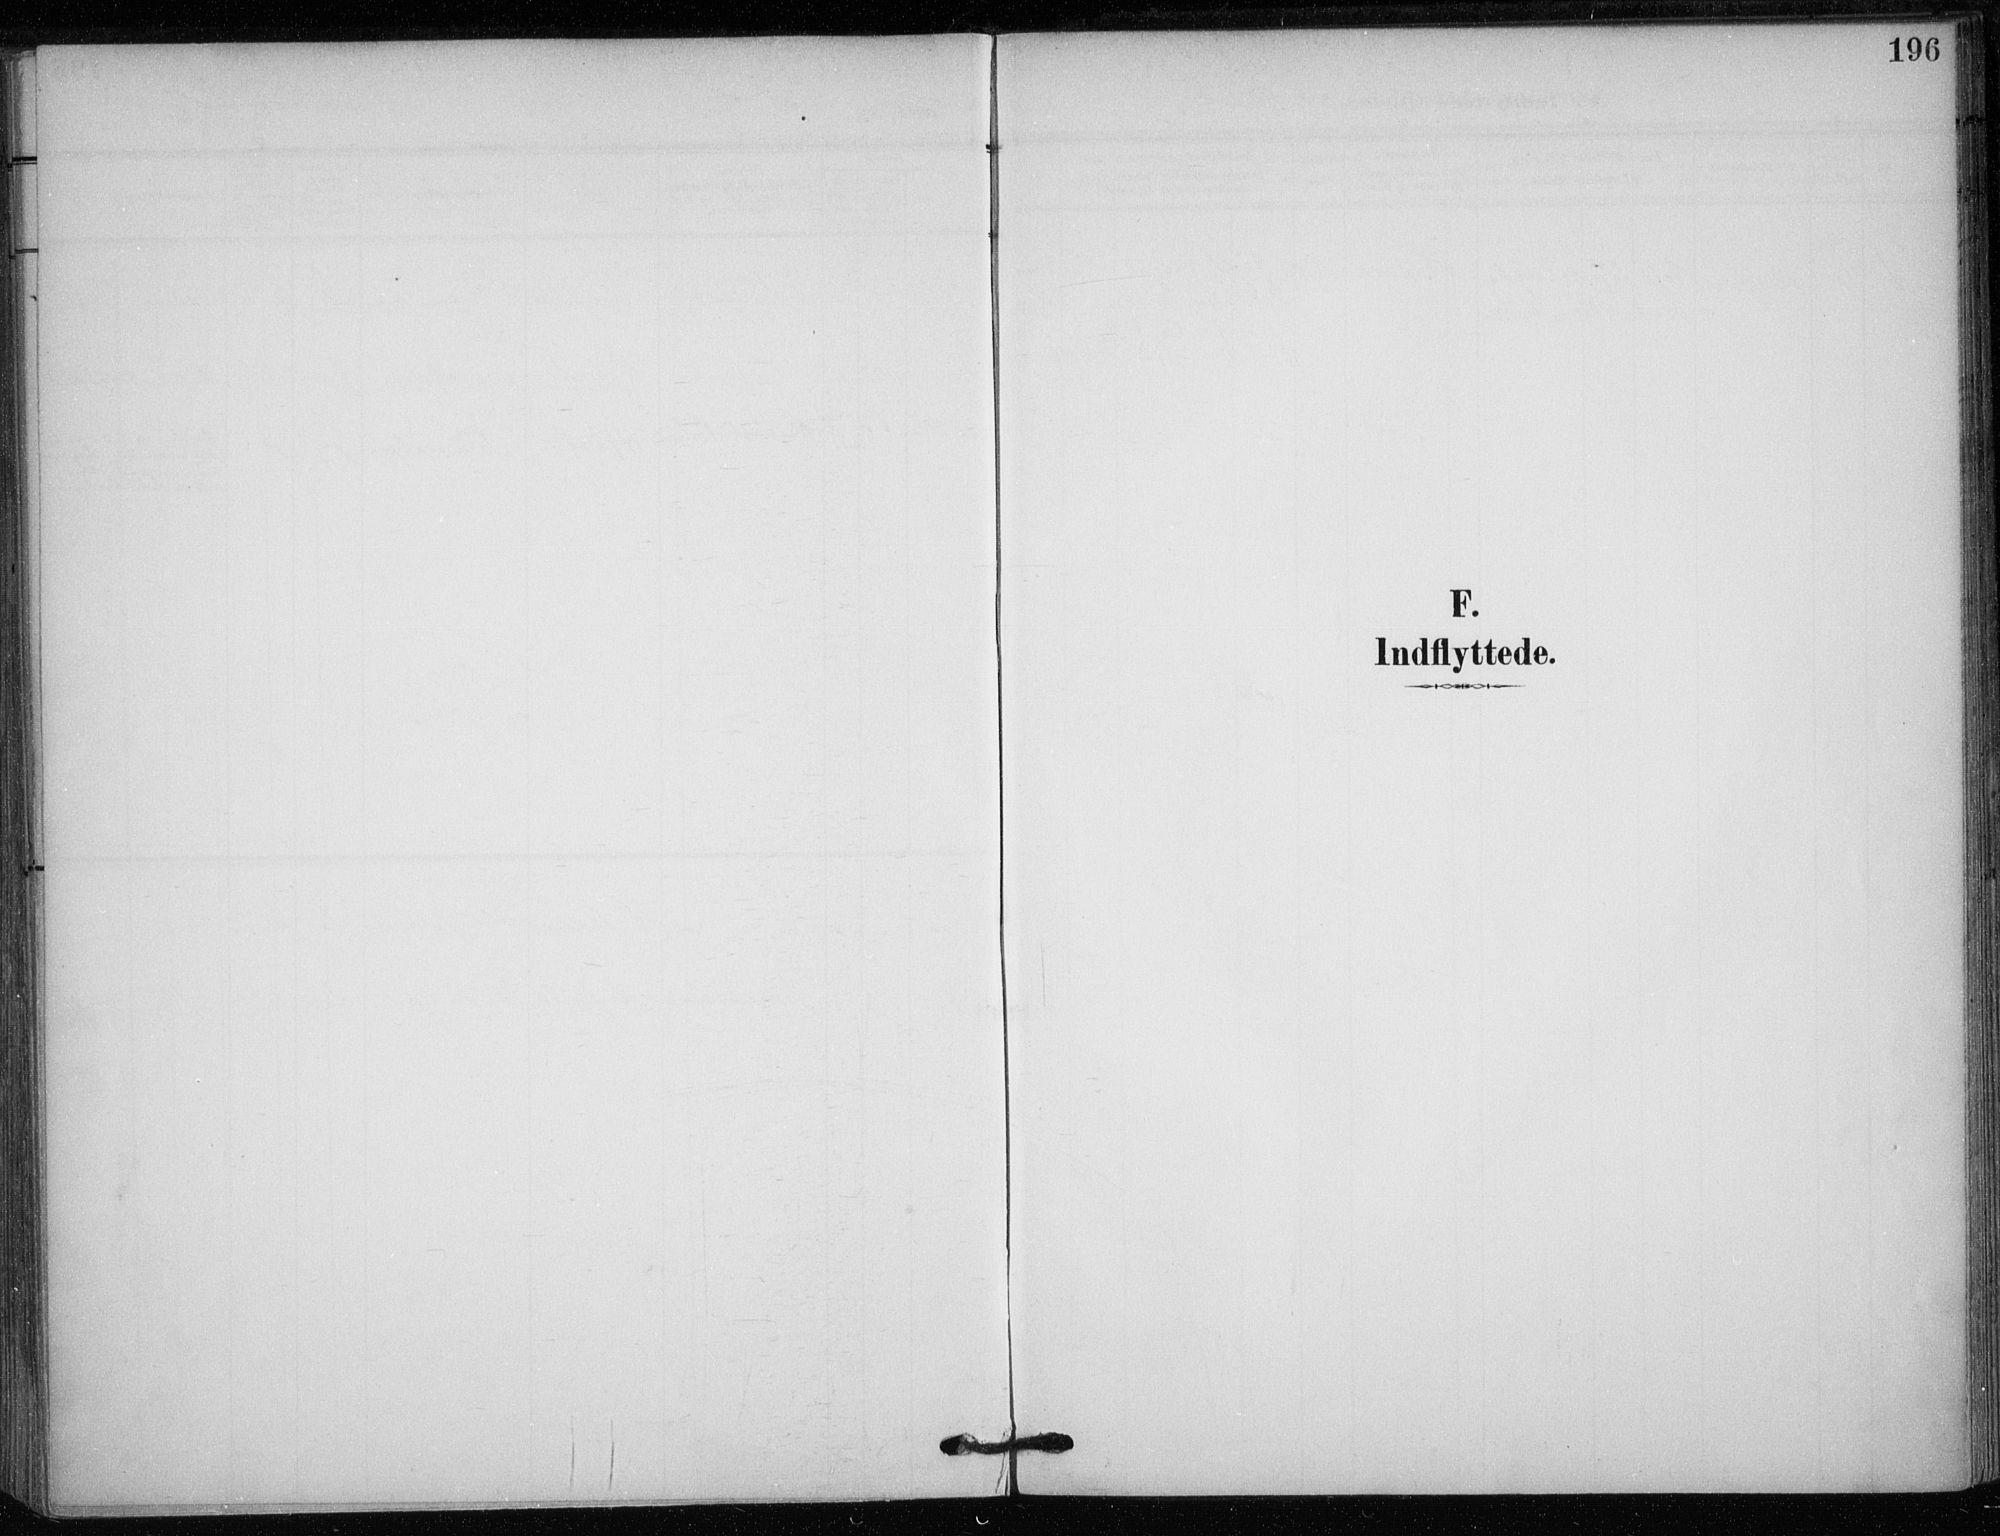 SATØ, Hammerfest sokneprestkontor, H/Ha/L0014.kirke: Parish register (official) no. 14, 1906-1916, p. 196